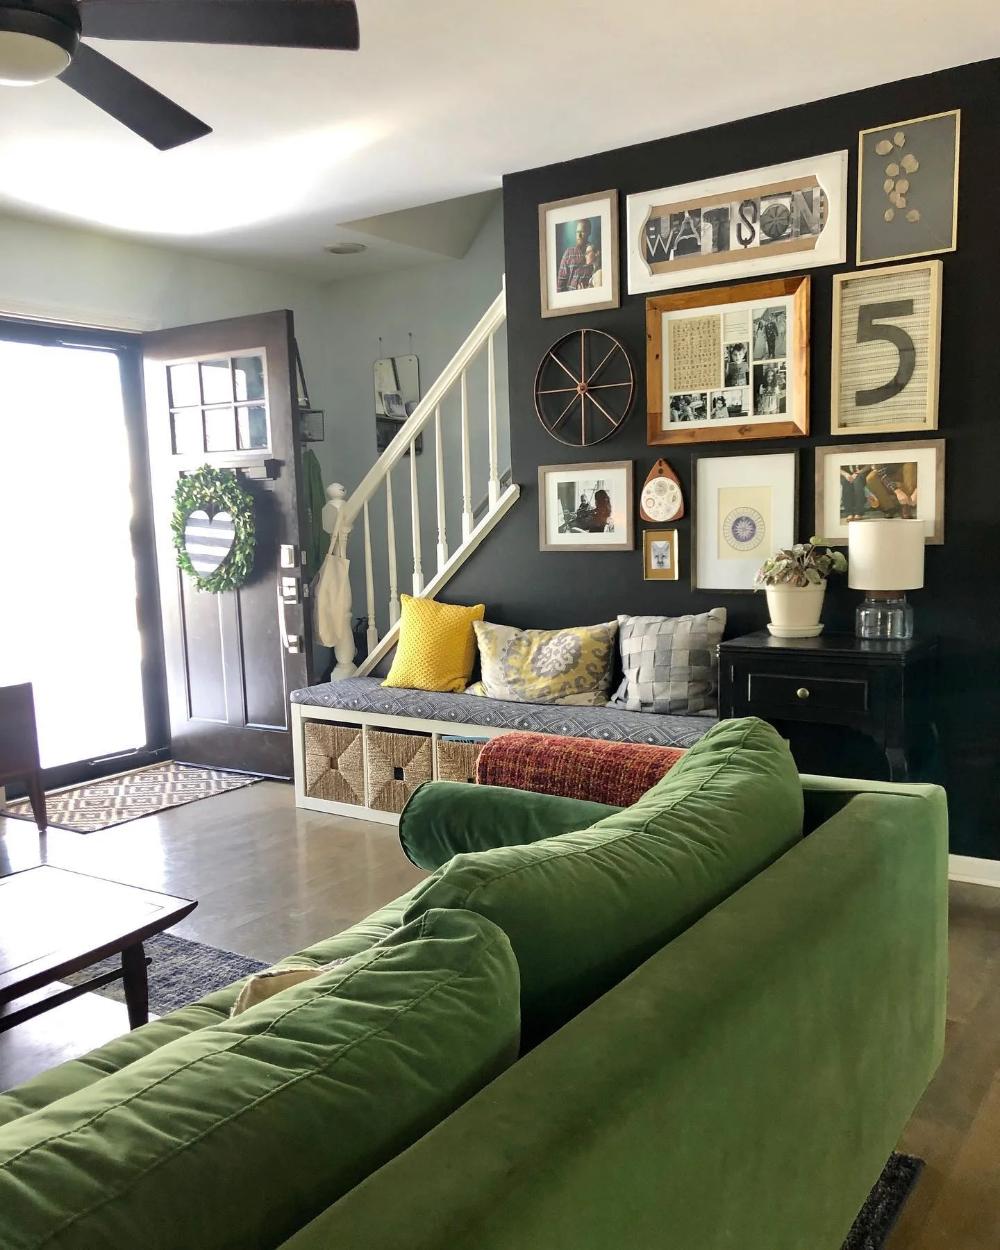 Sven Grass Green Sofa in 2020 | Green sofa, Living room ...